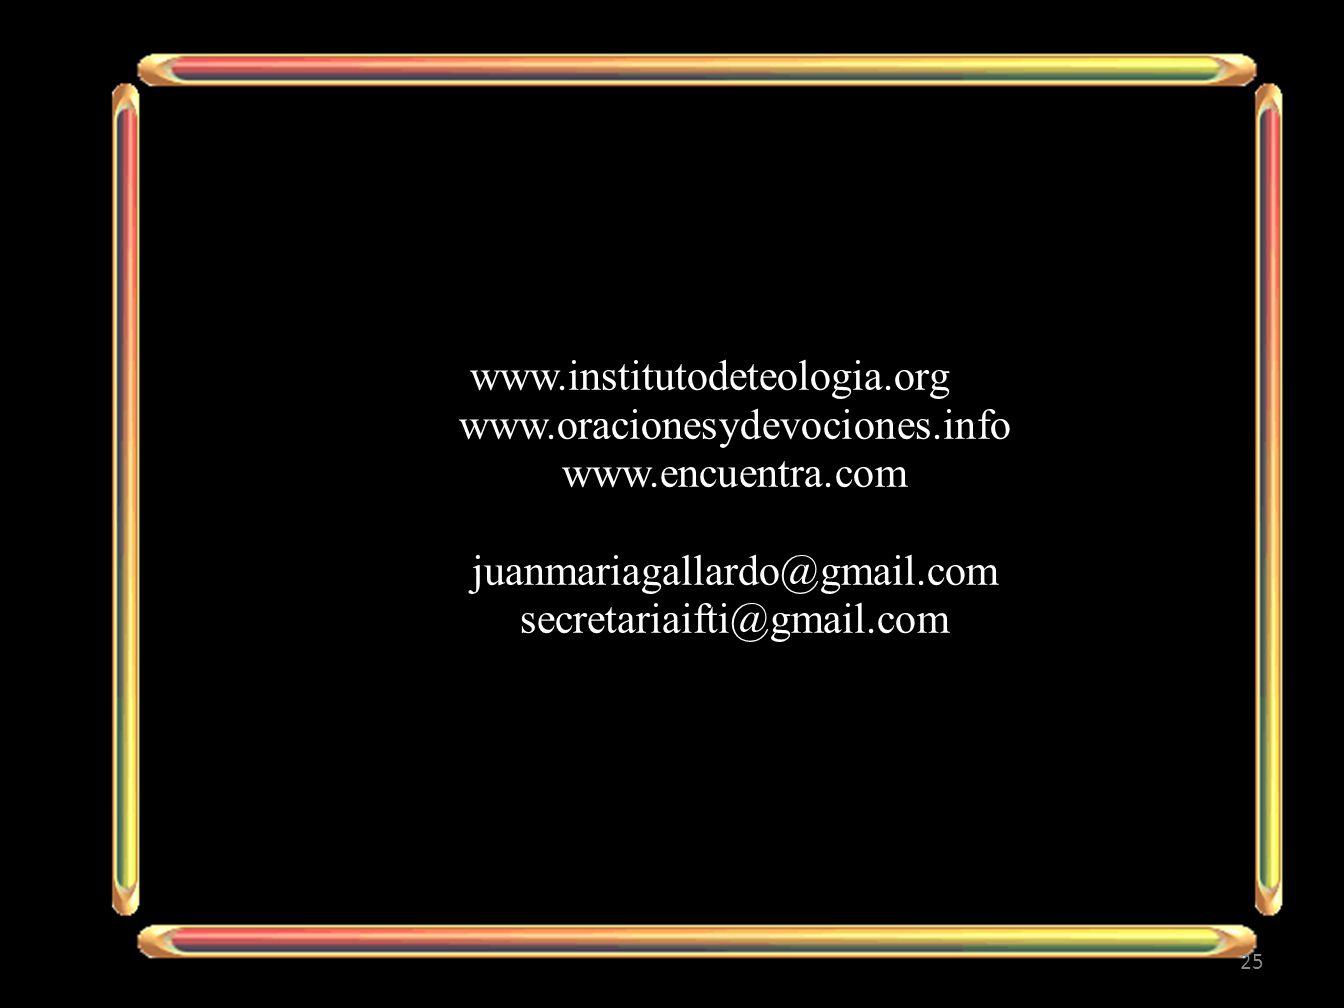 www.institutodeteologia.org www.oracionesydevociones.info www.encuentra.com juanmariagallardo@gmail.com secretariaifti@gmail.com 25